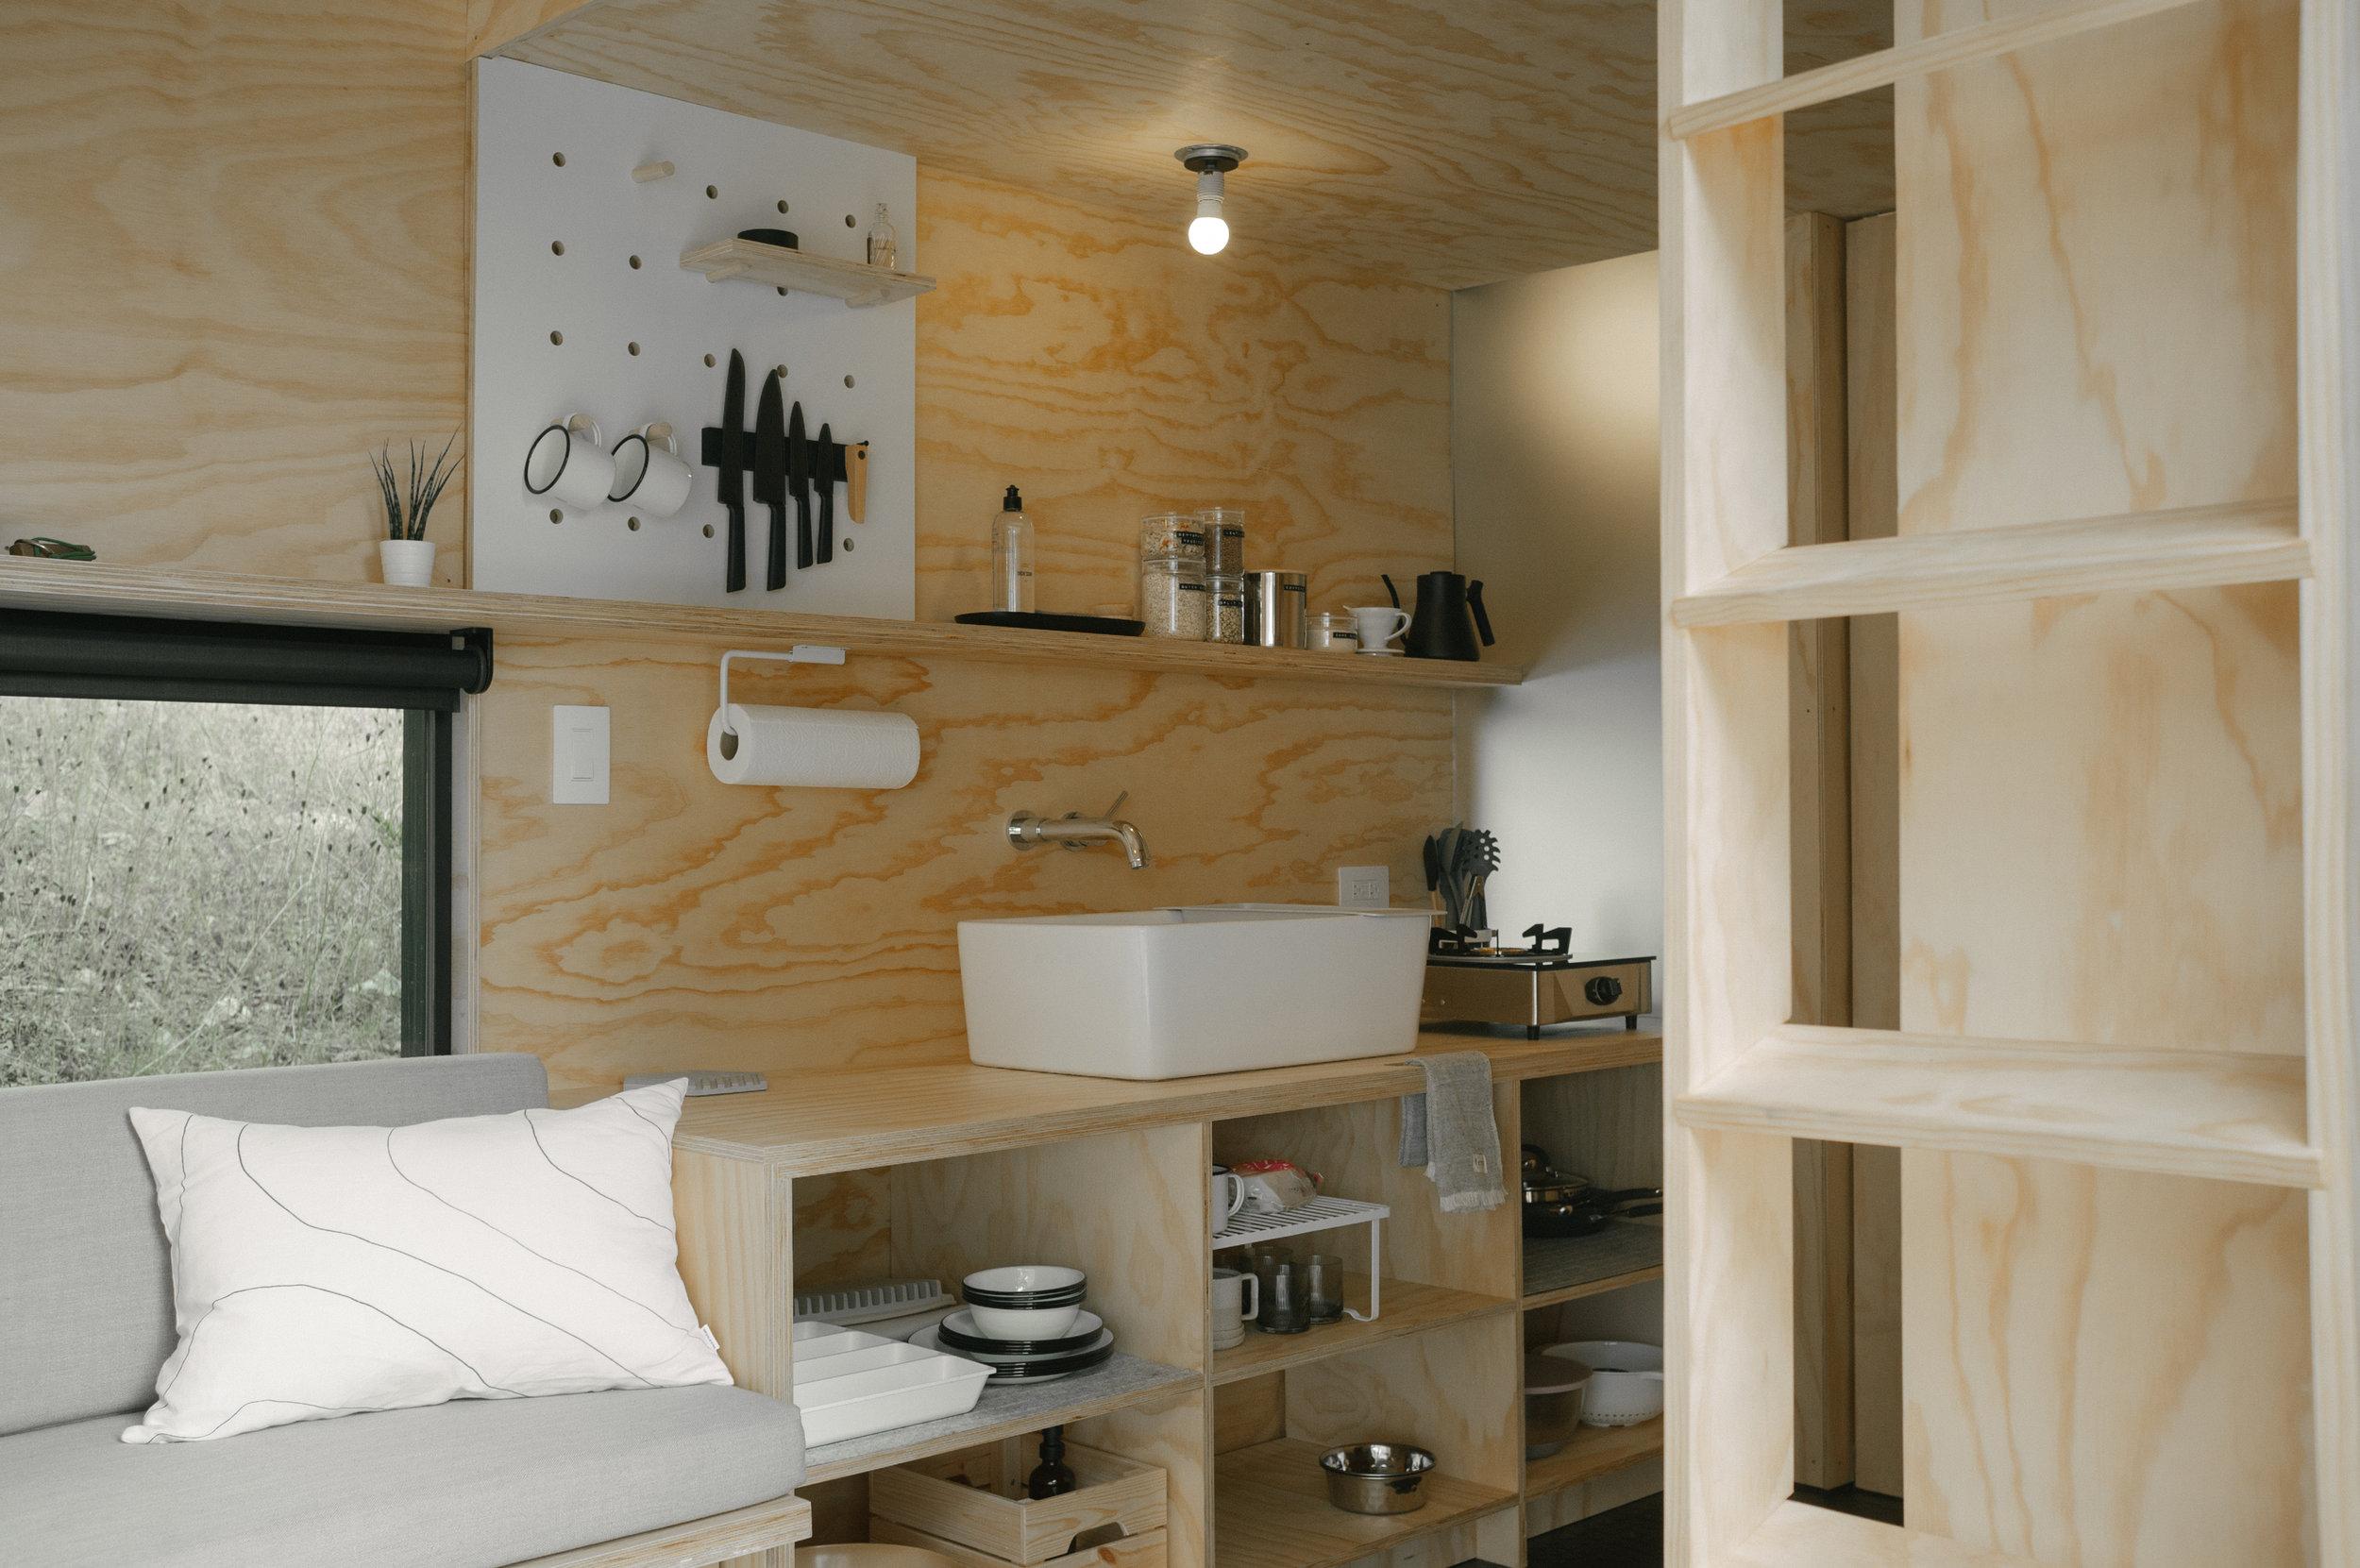 Elsewhere-Cabin-A-022.jpg